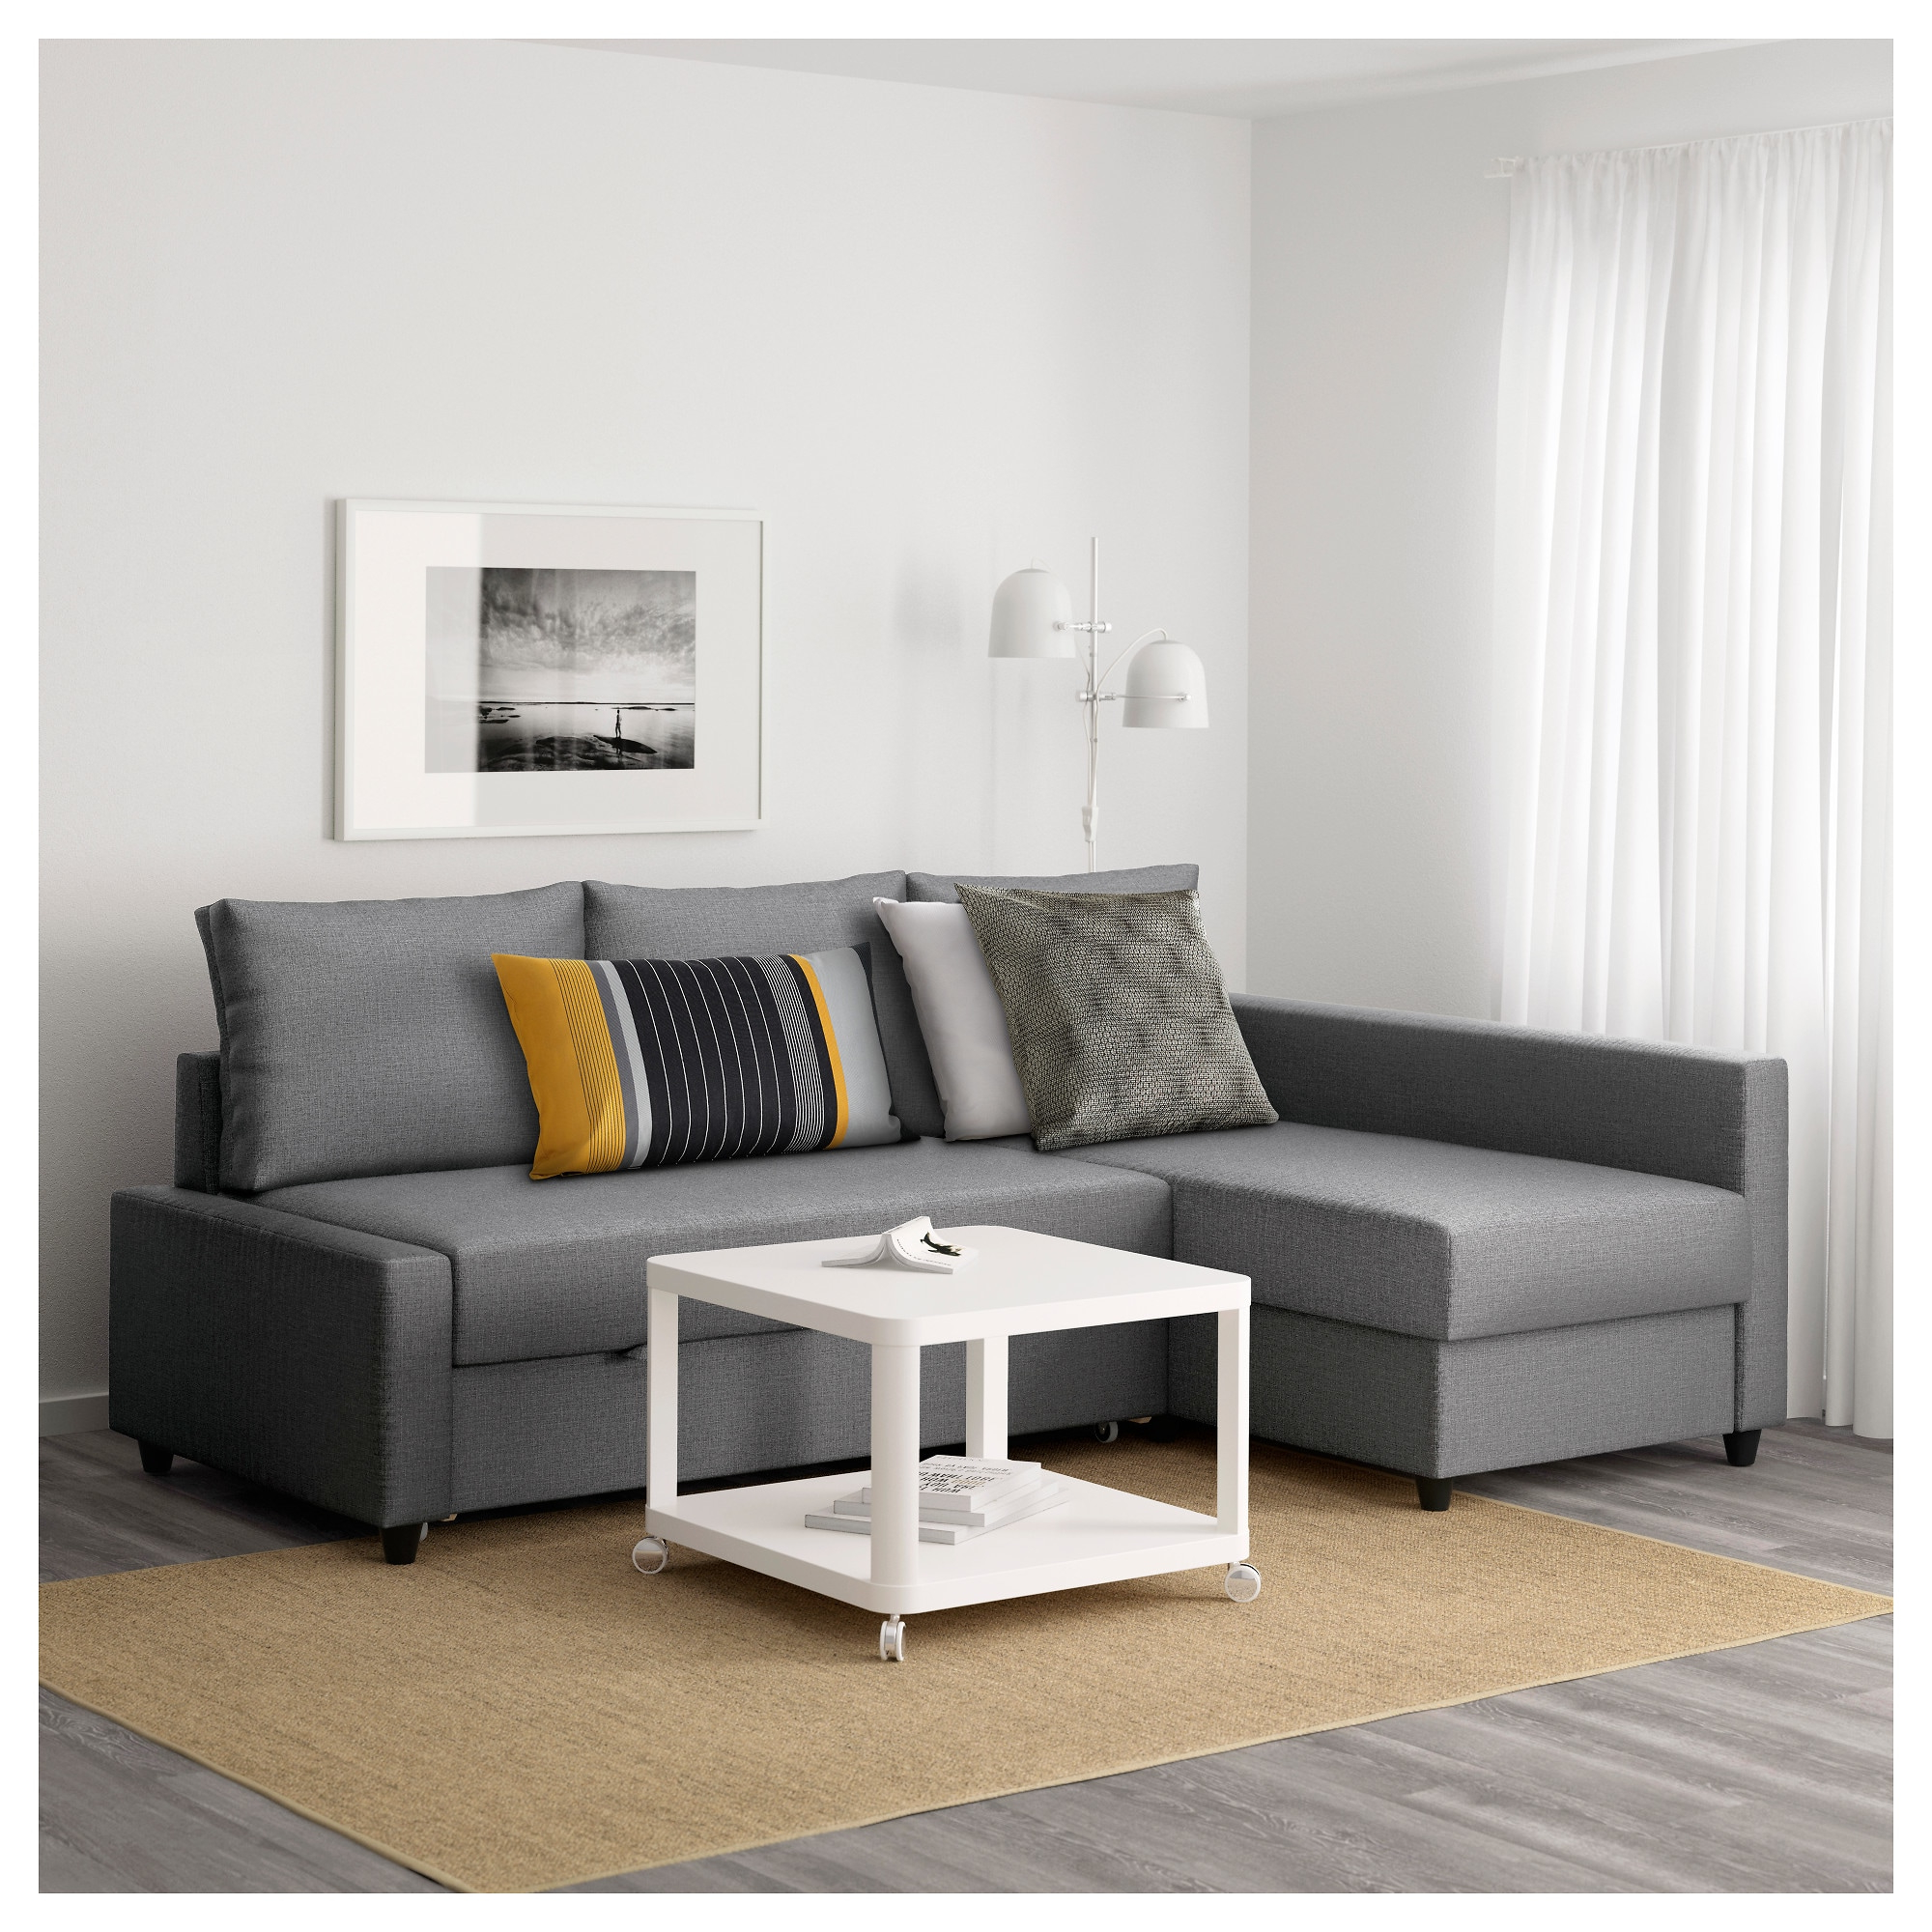 Ikea Catalogo Sofas Drdp Sofã S Y Sillones Pra Online Ikea Sharon Leal